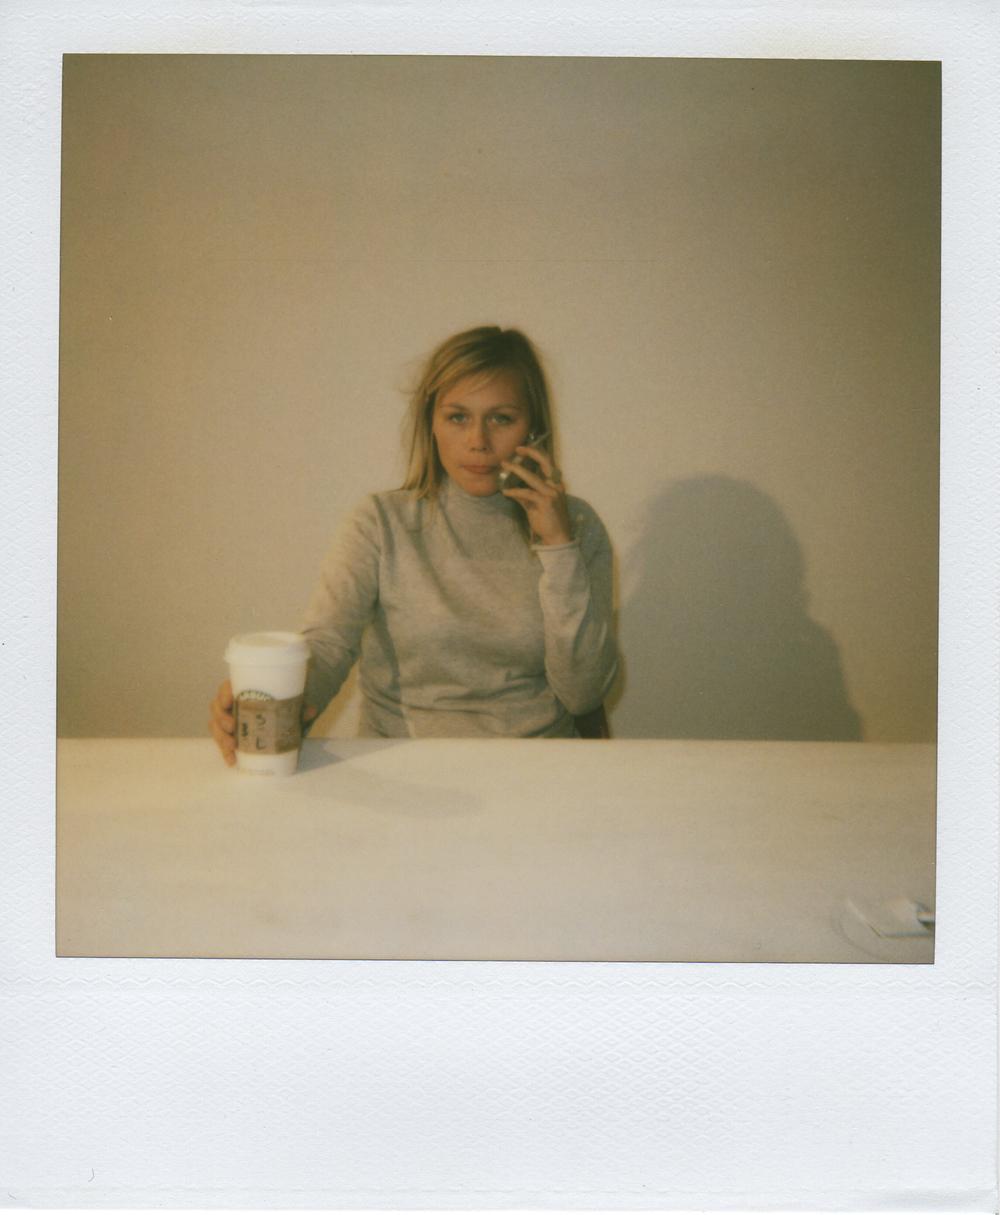 jlaurence-polaroid-010.jpg